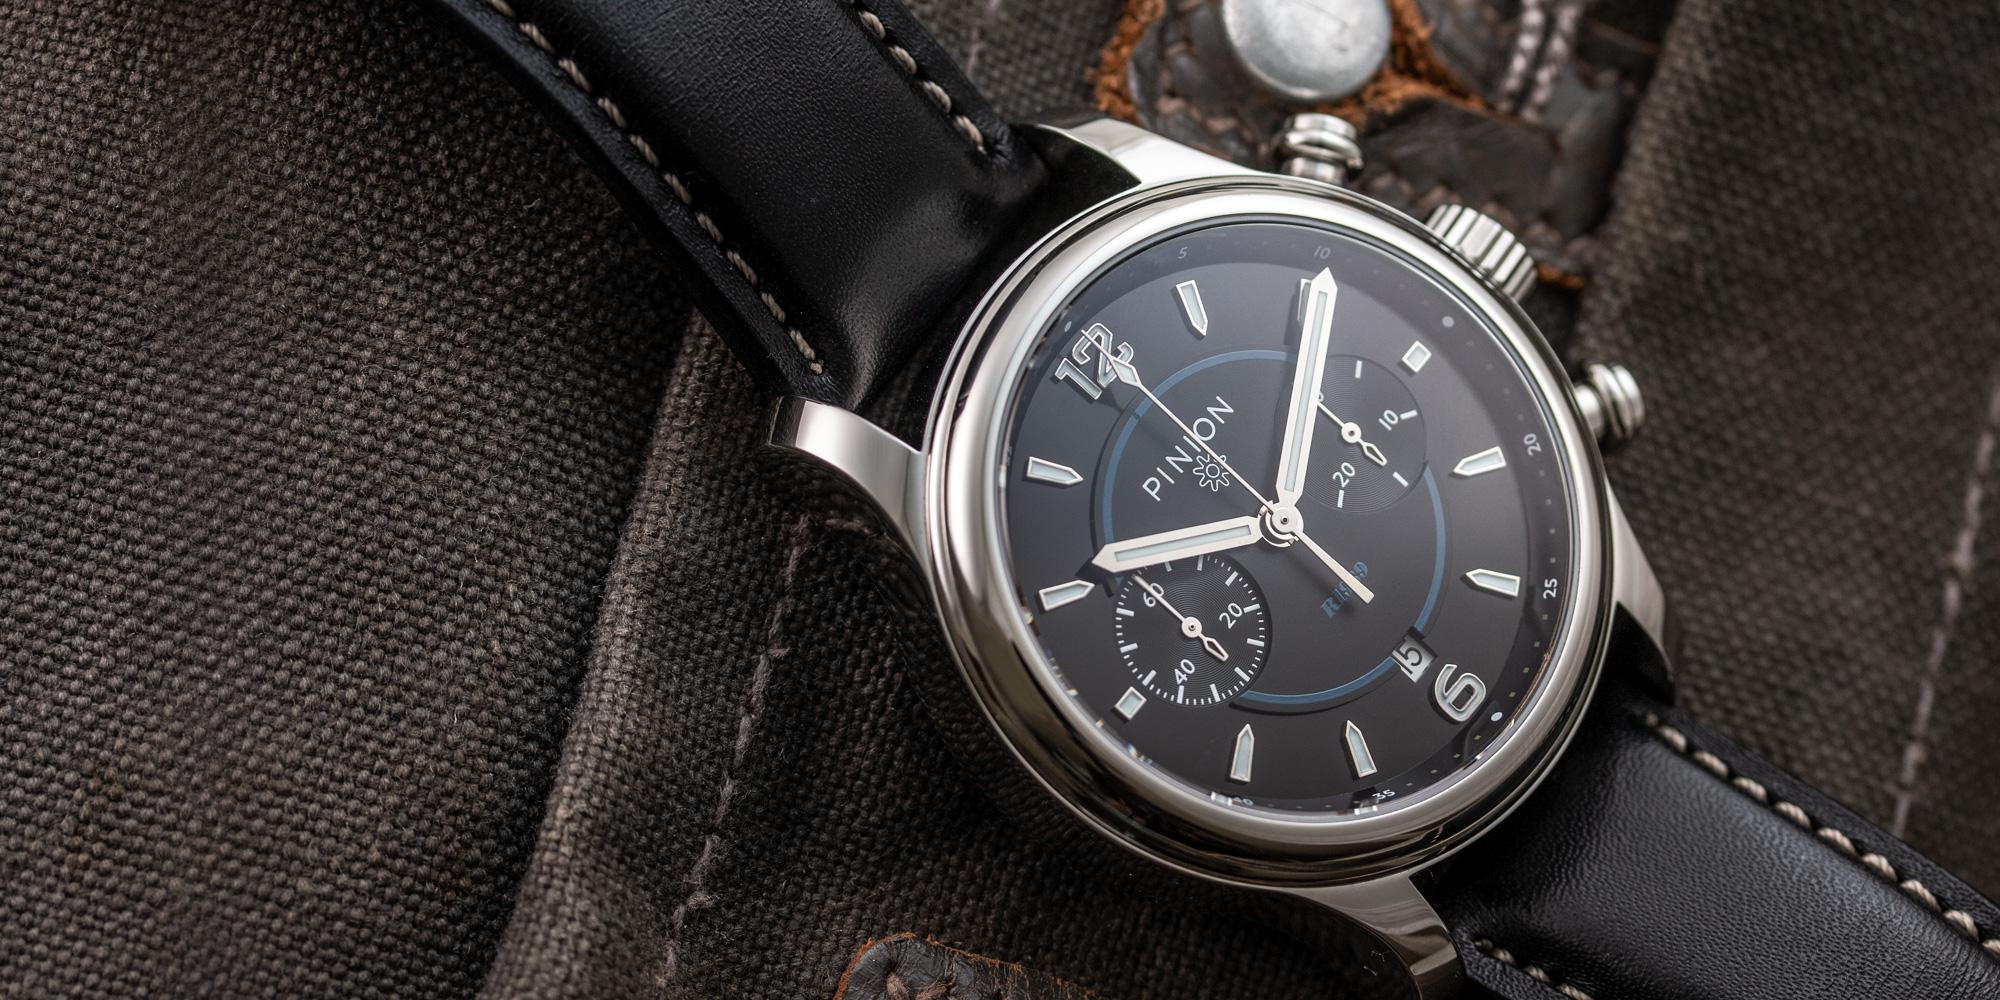 pinion-r1969-valjoux-7734-chronograph